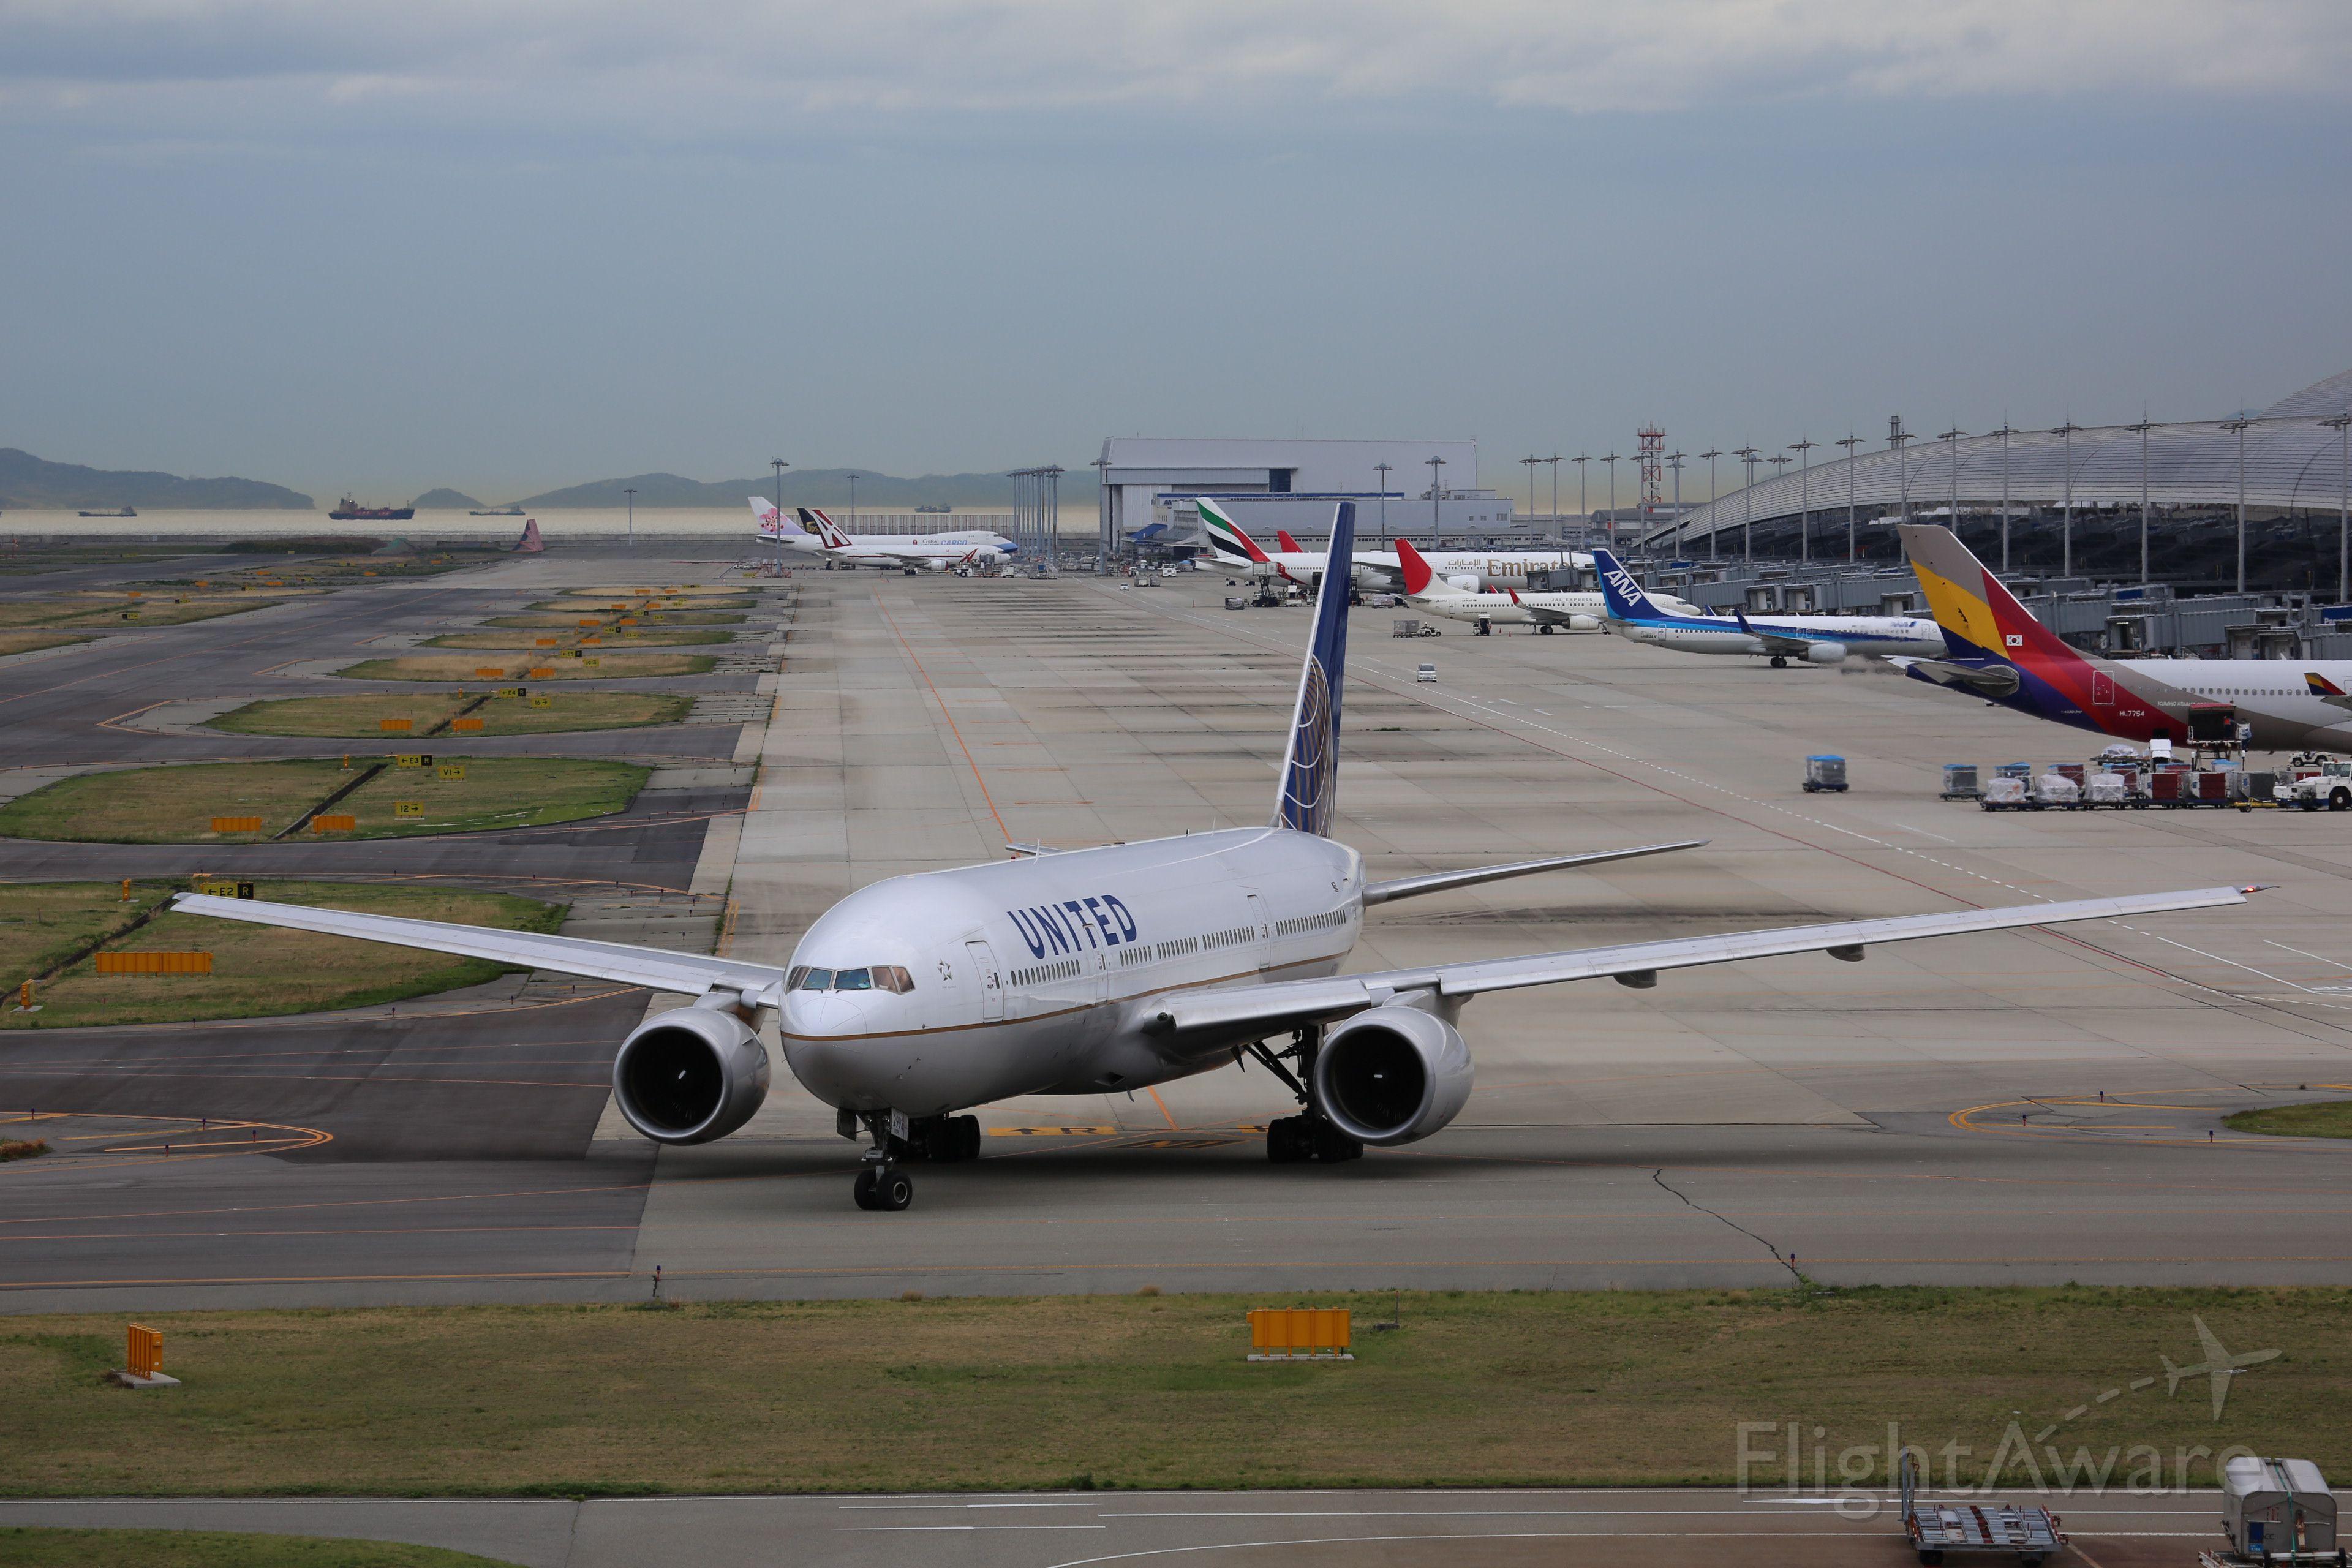 Boeing 777-200 (N793UA)